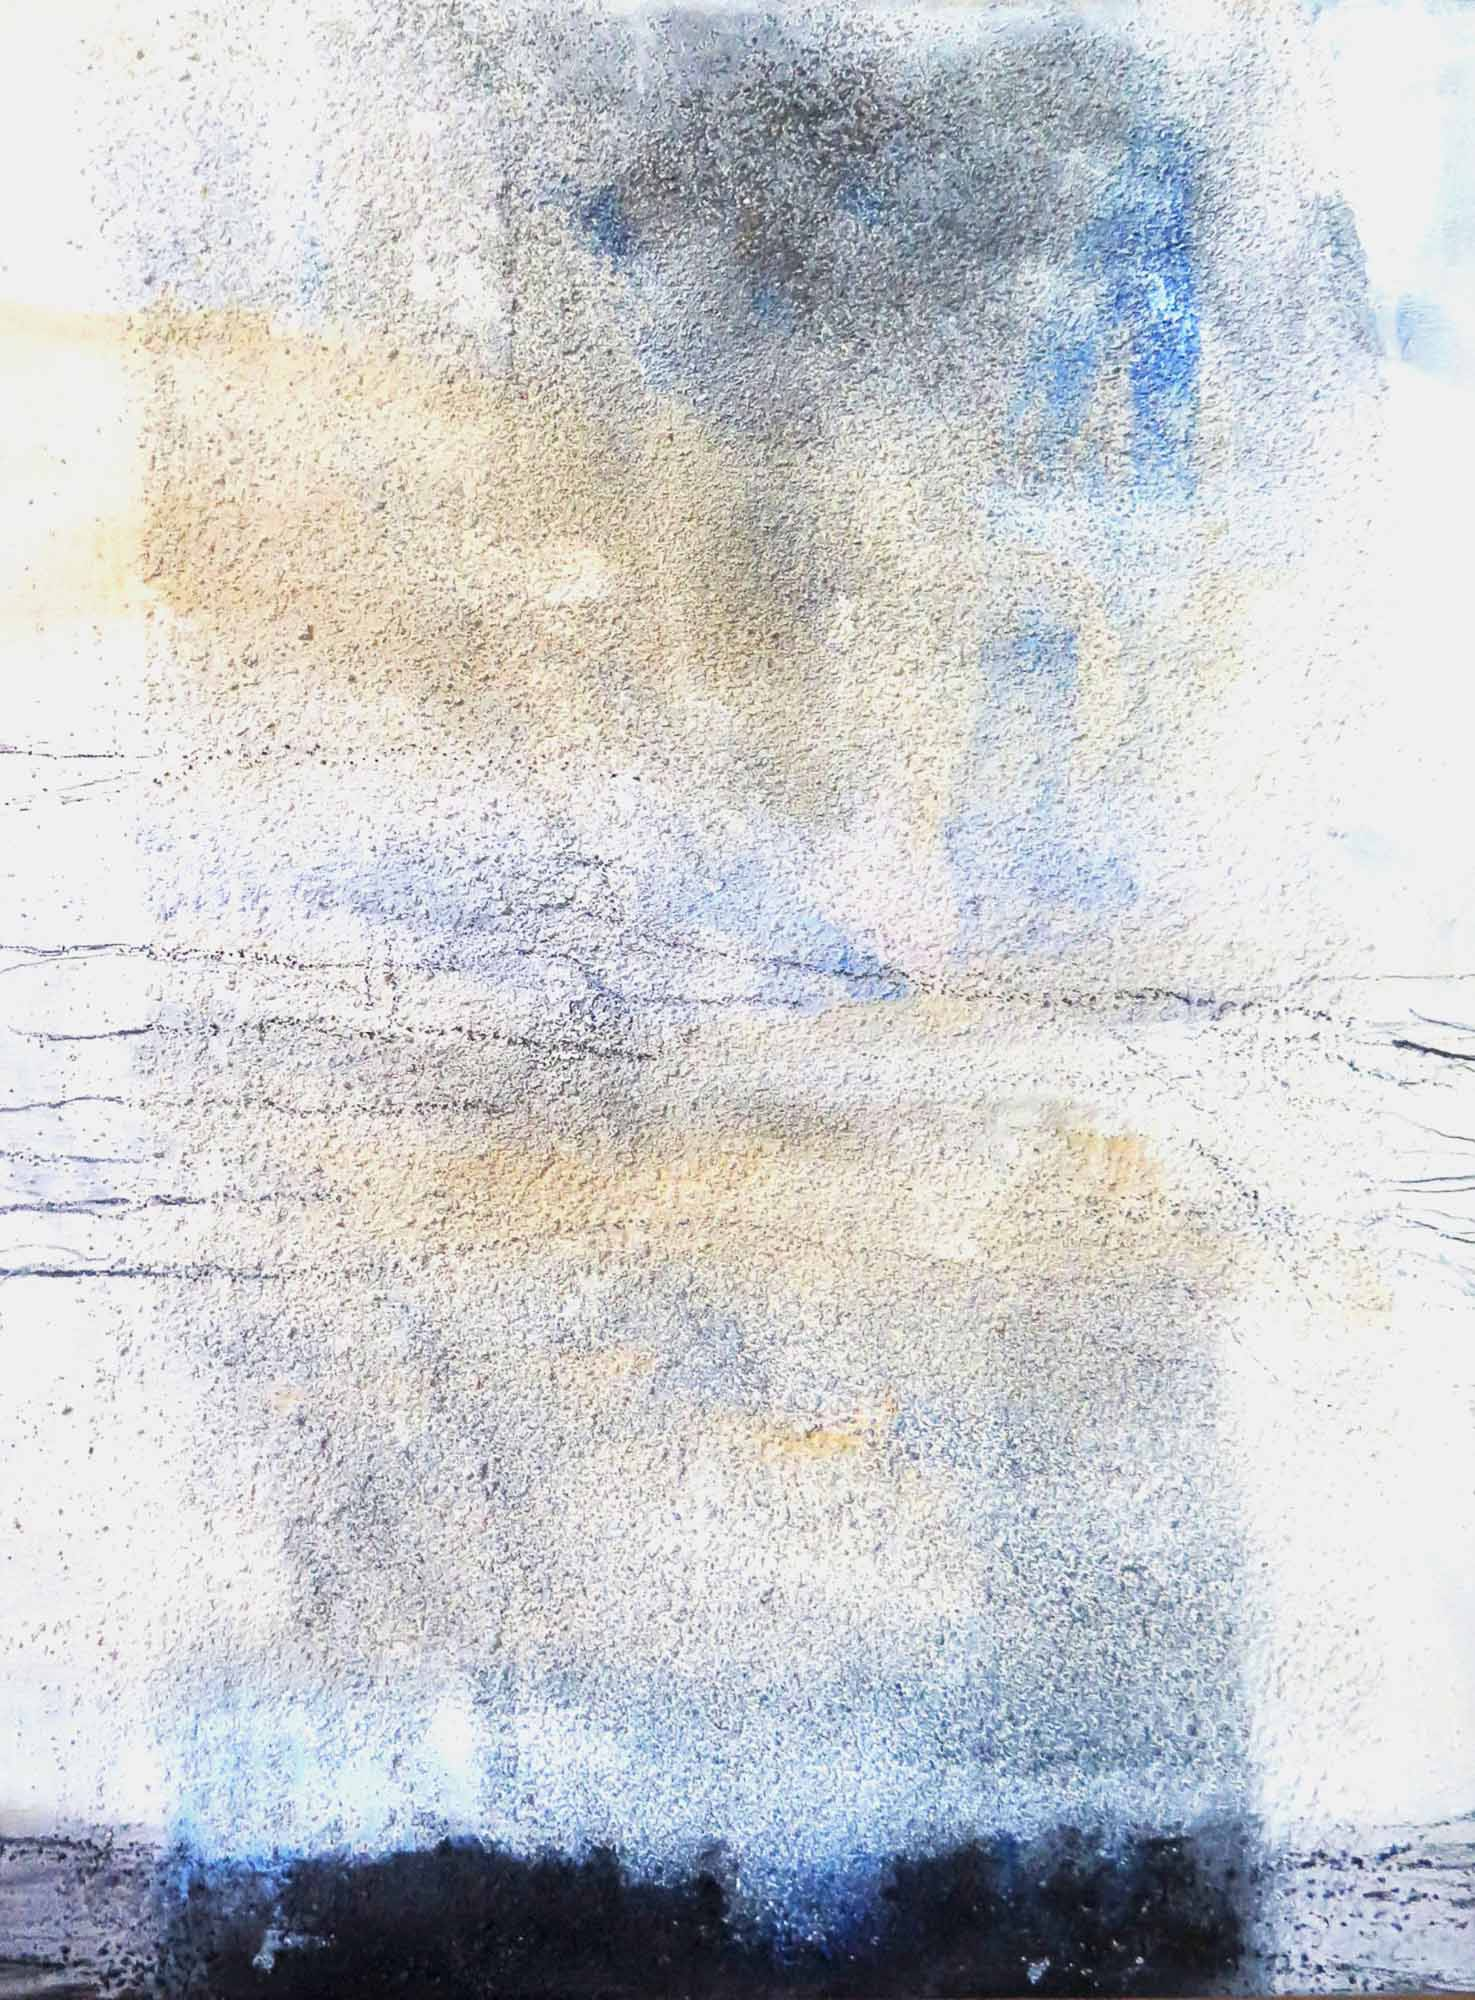 Malerei: Clarissa Mendes, Öl, Acryl, Sand, Graphit auf Leinwand, 30 × 40, 2014